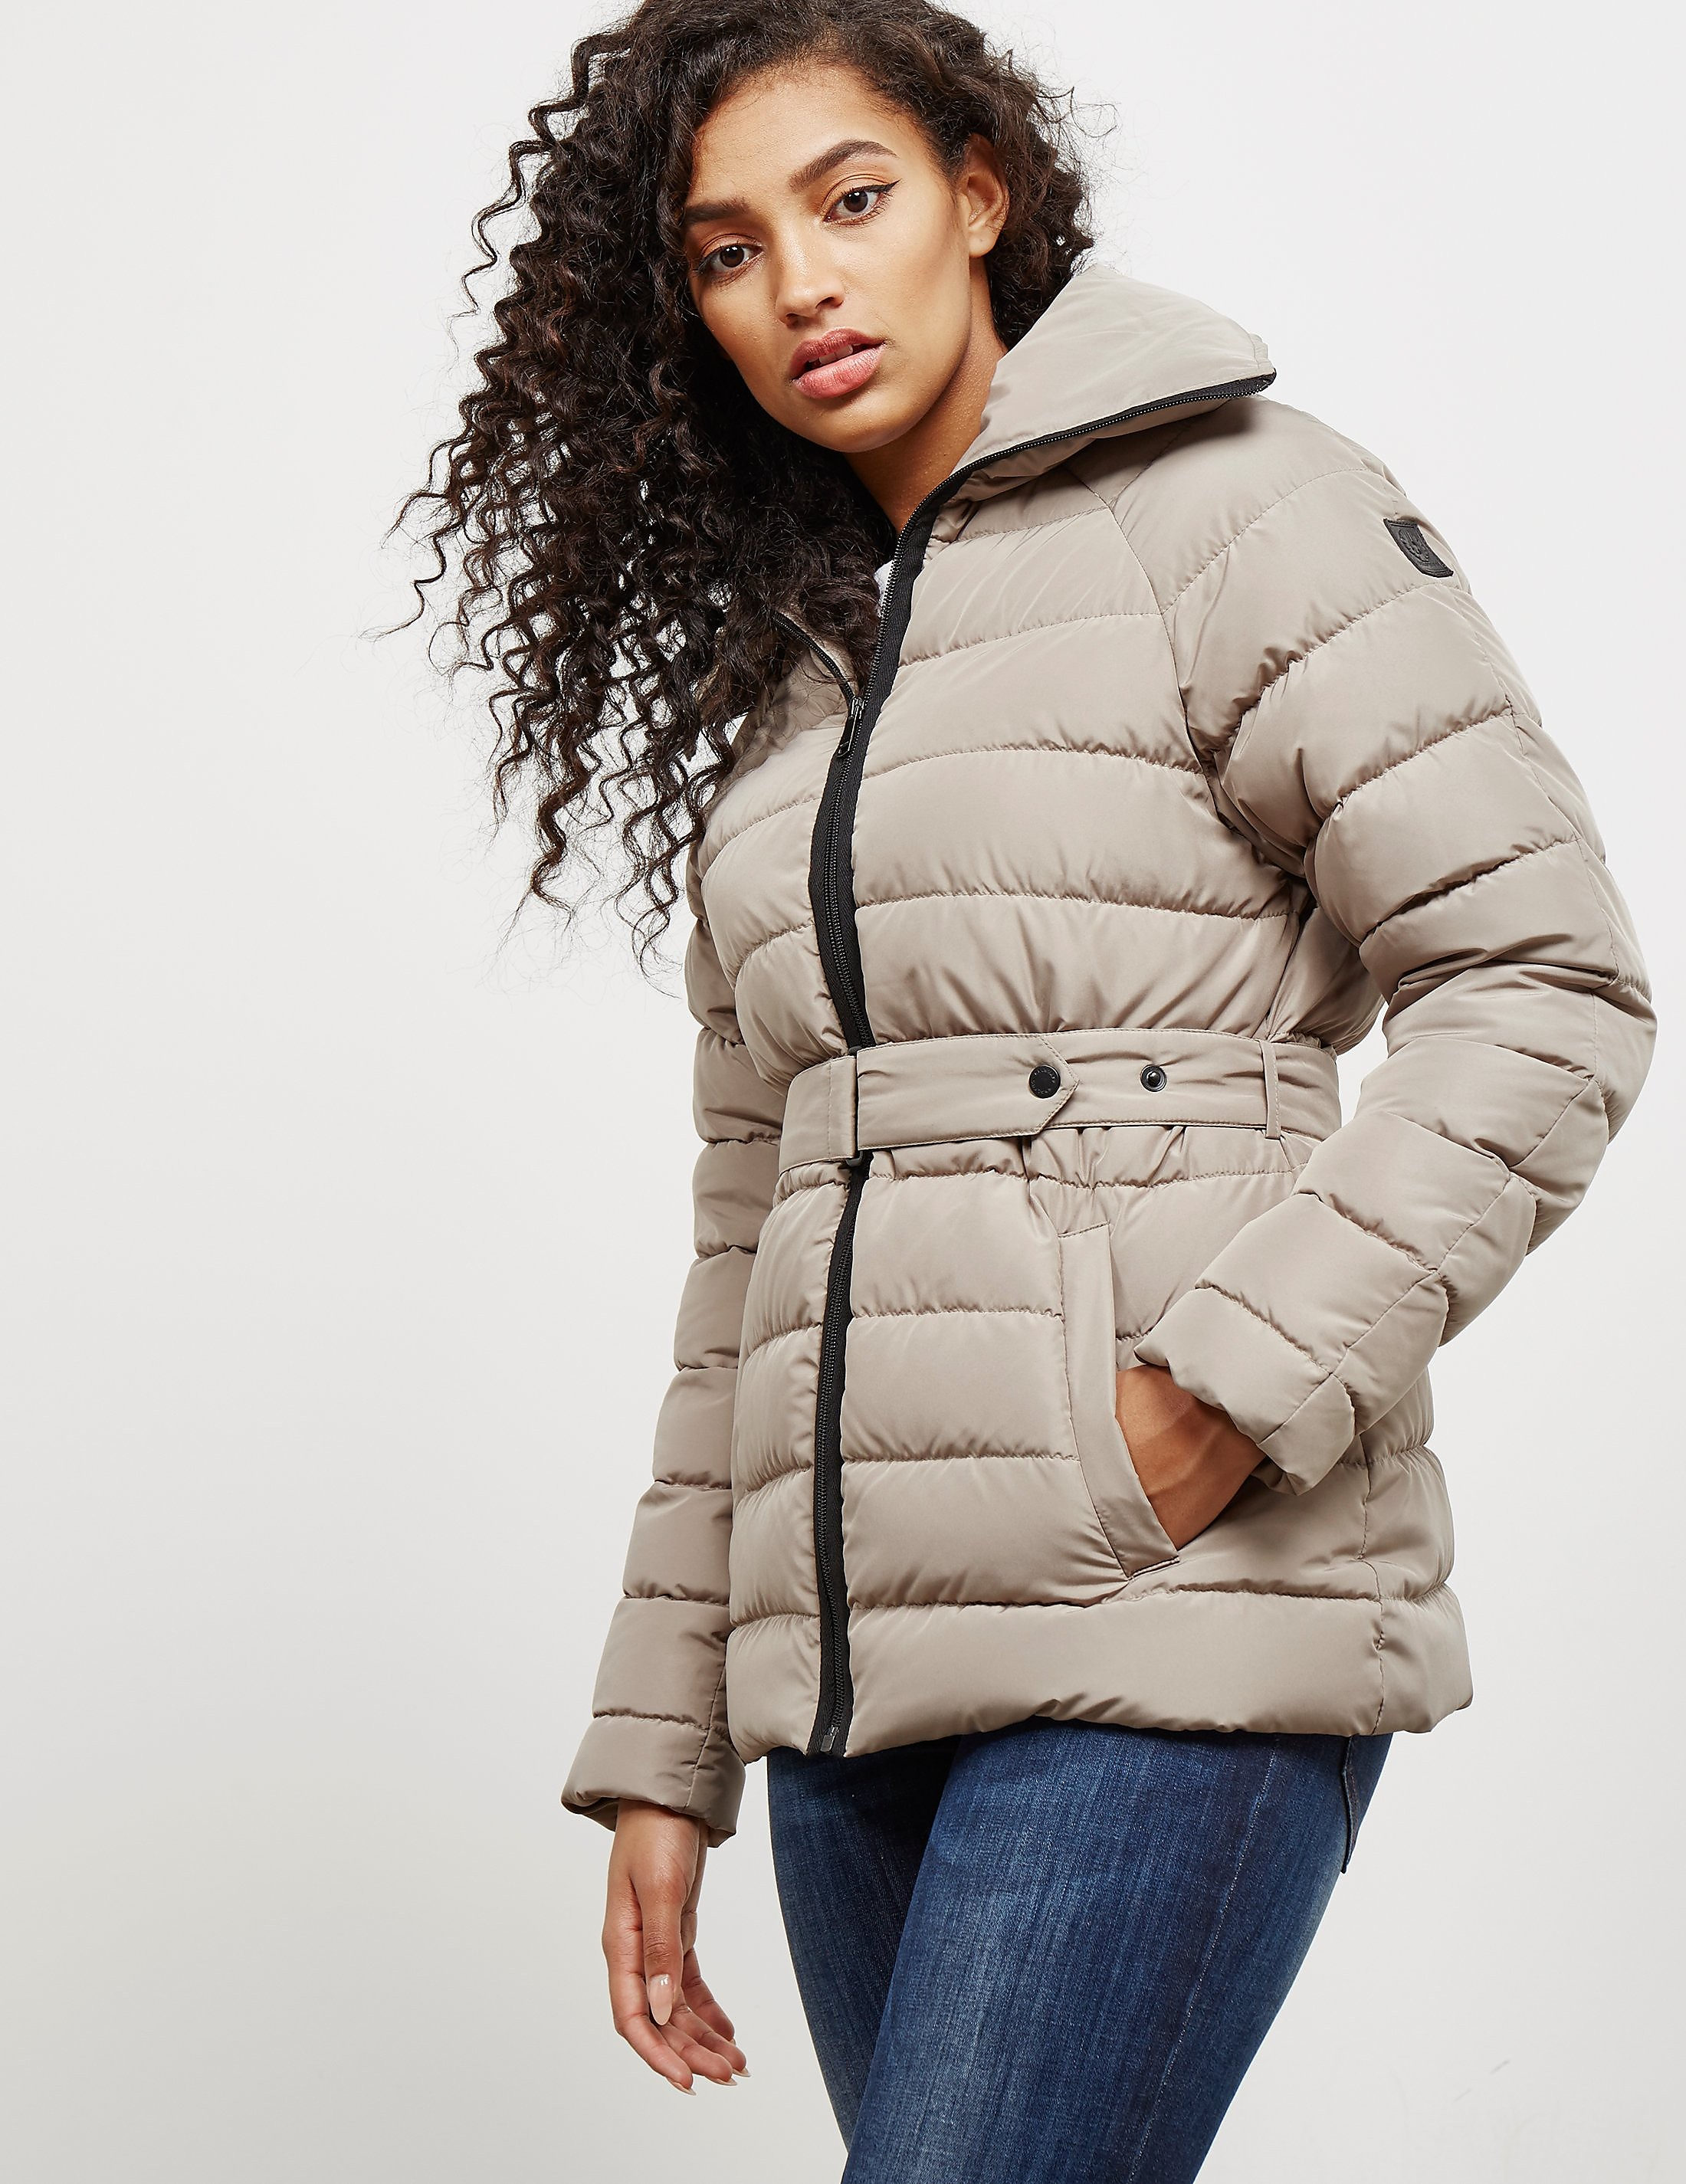 Belstaff Heringham Padded Jacket